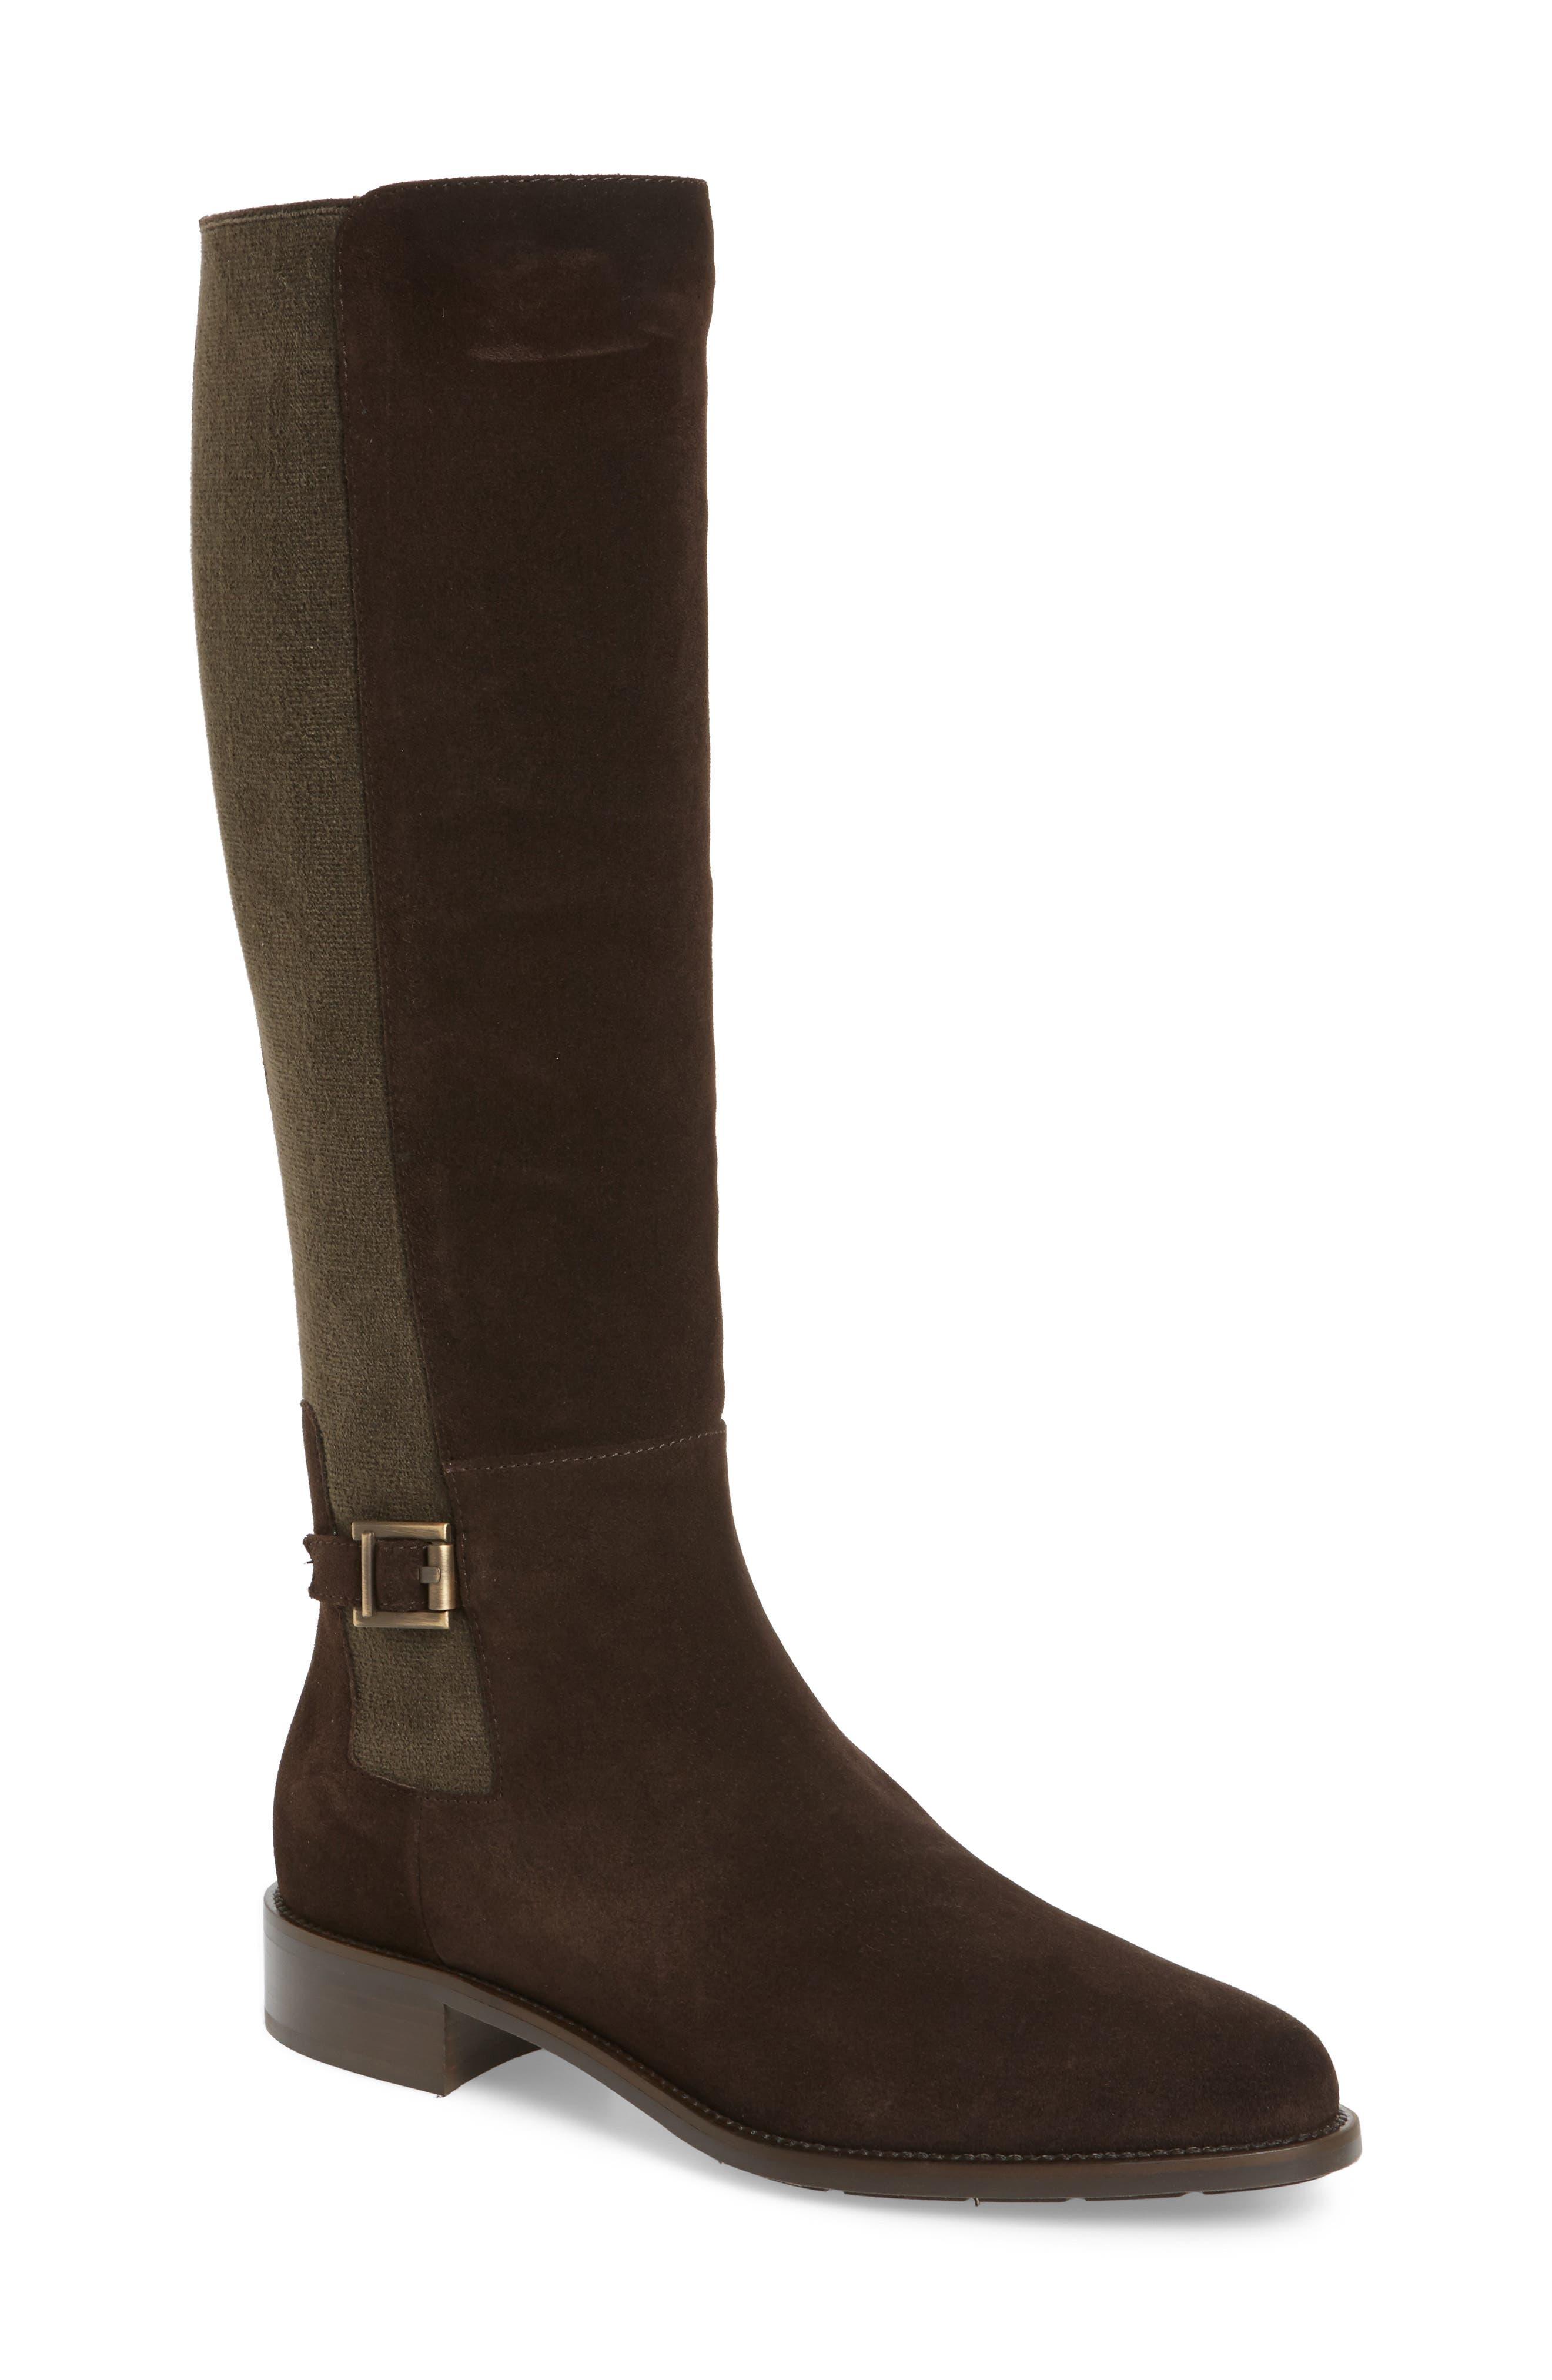 Main Image - Aquatalia Noella Weatherproof Tall Boot (Women)